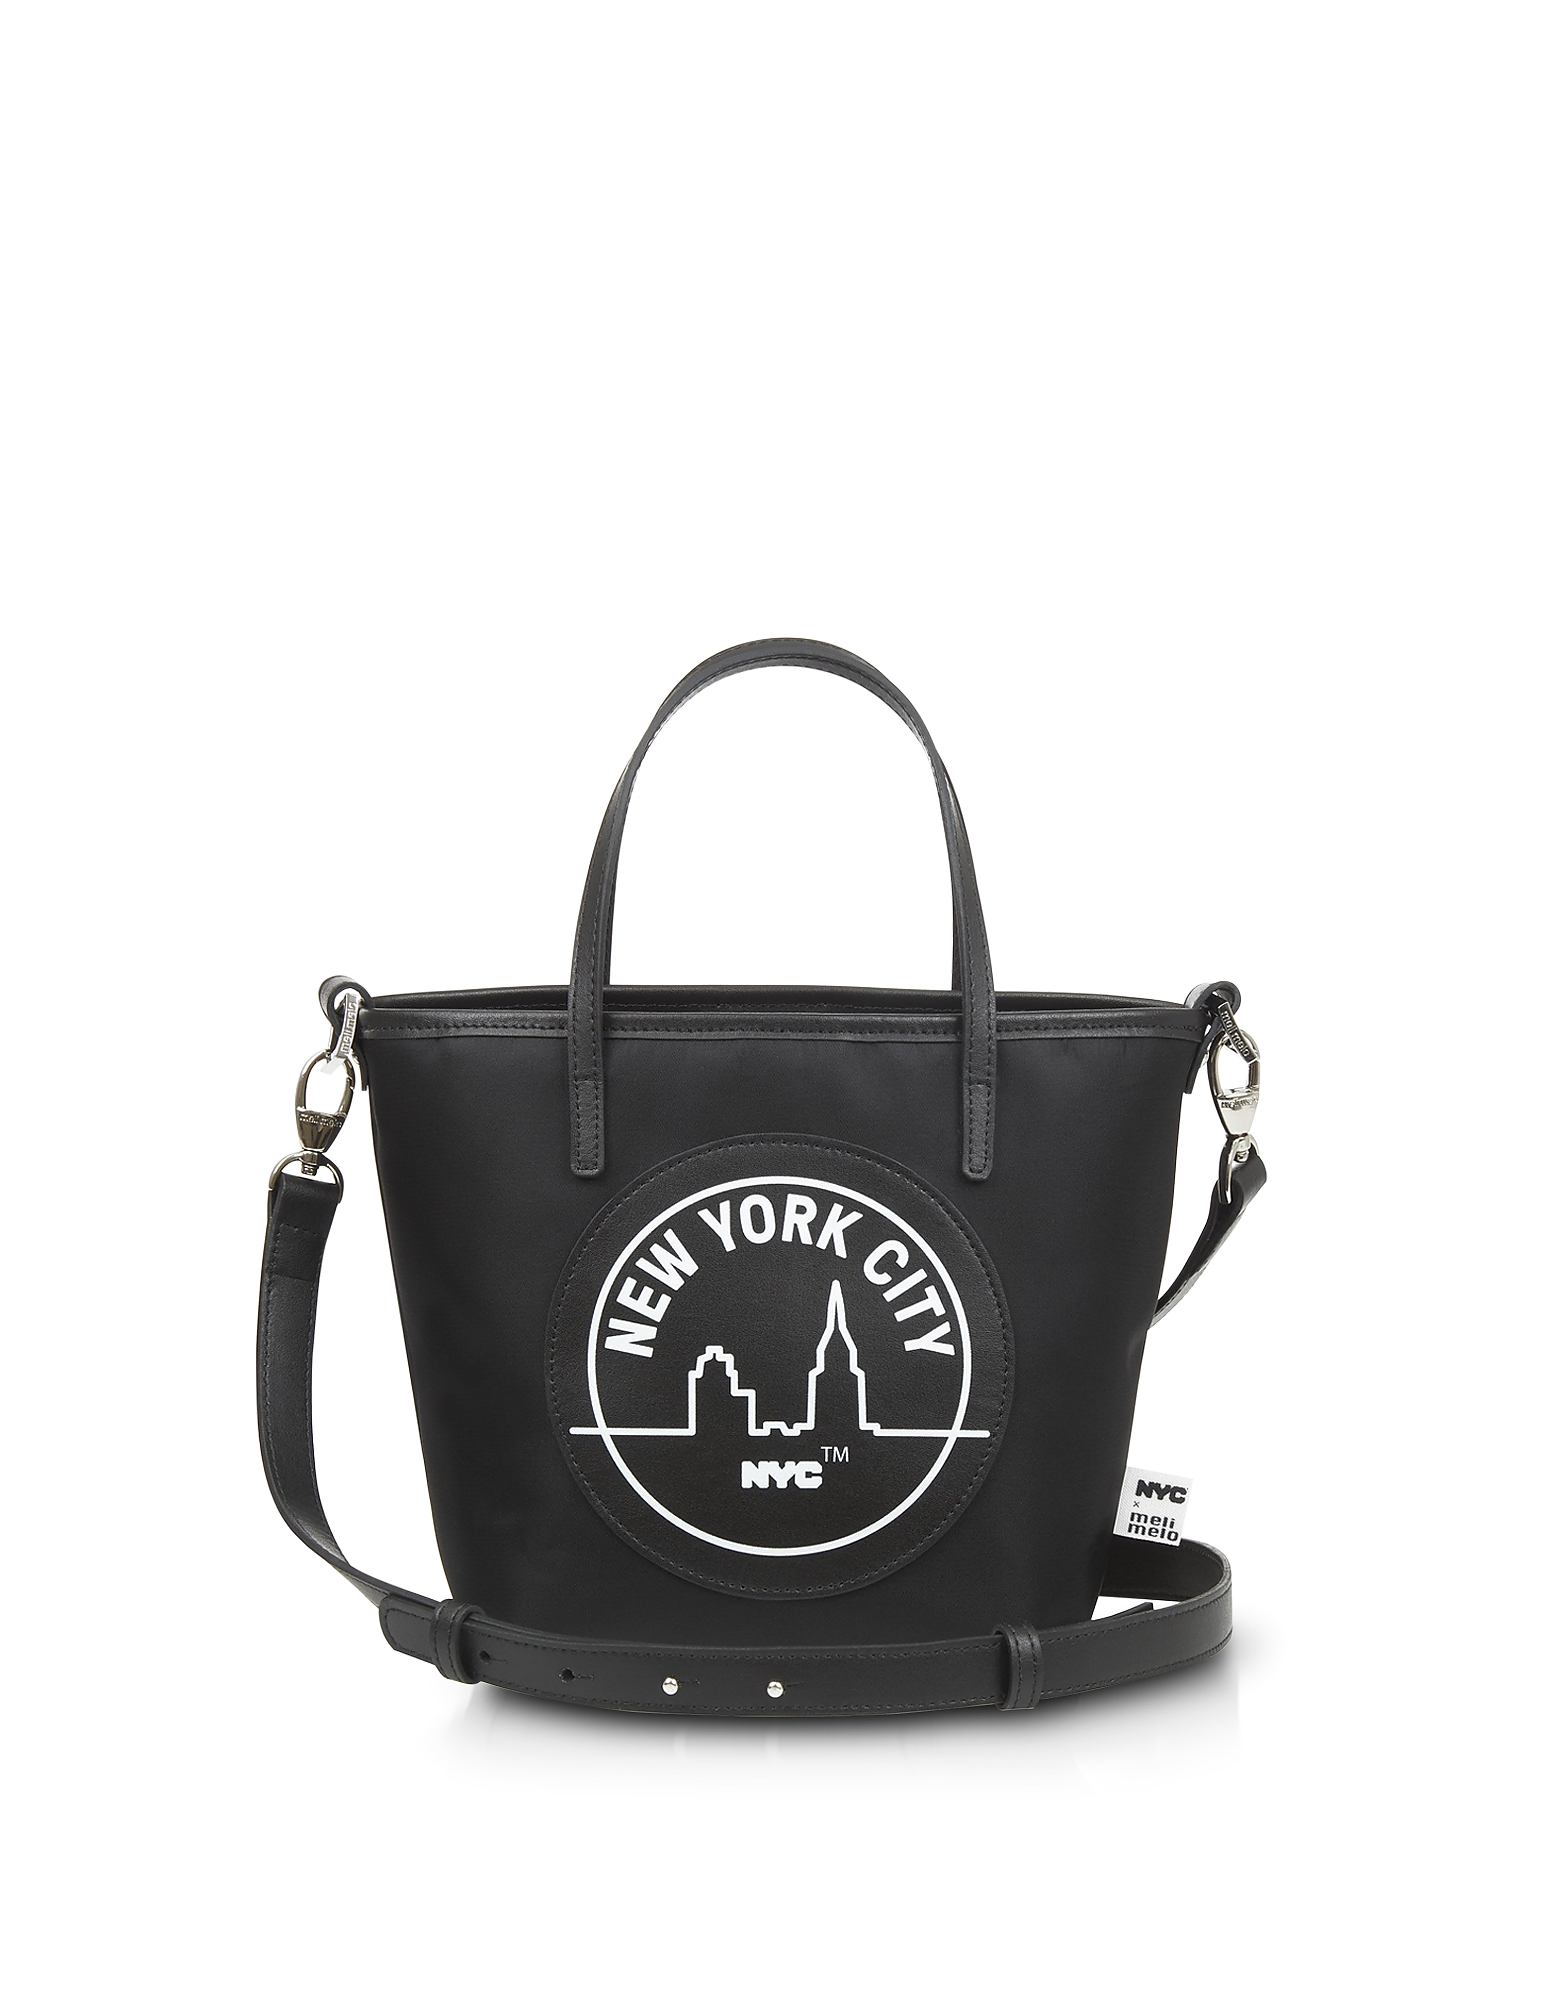 Meli Melo Designer Handbags, Black Paige Mini Tote